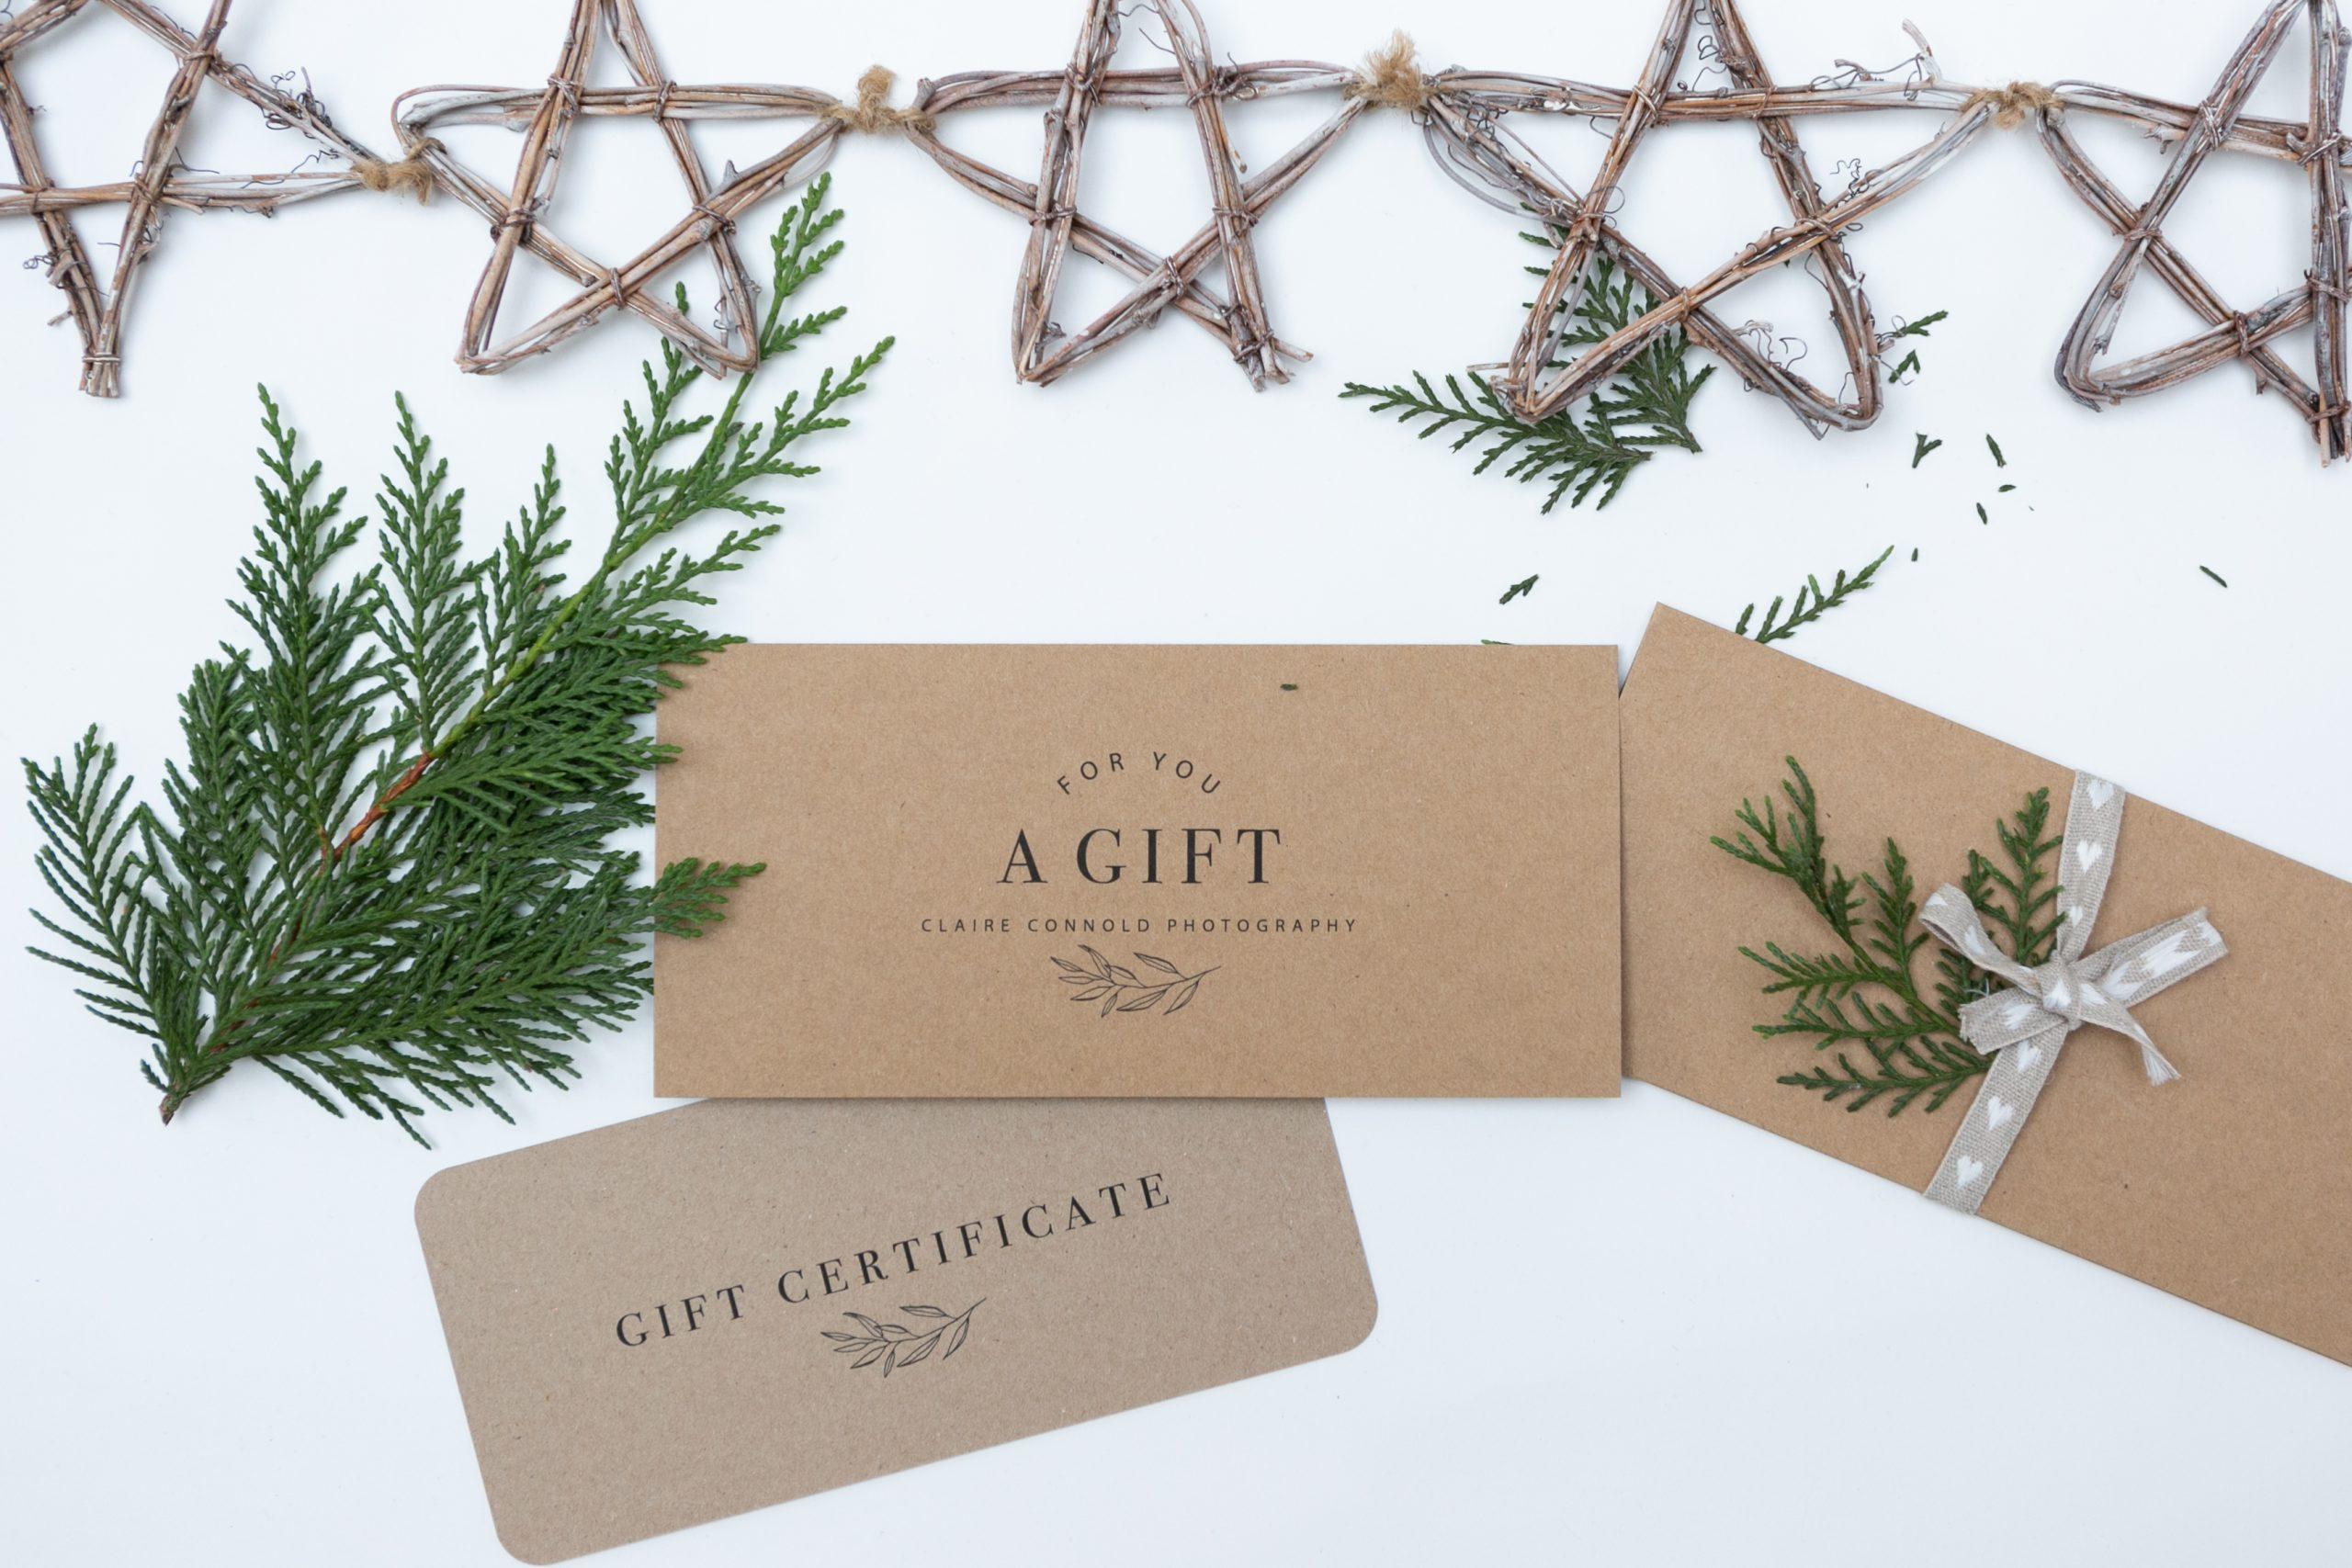 photo Christmas gift voucher